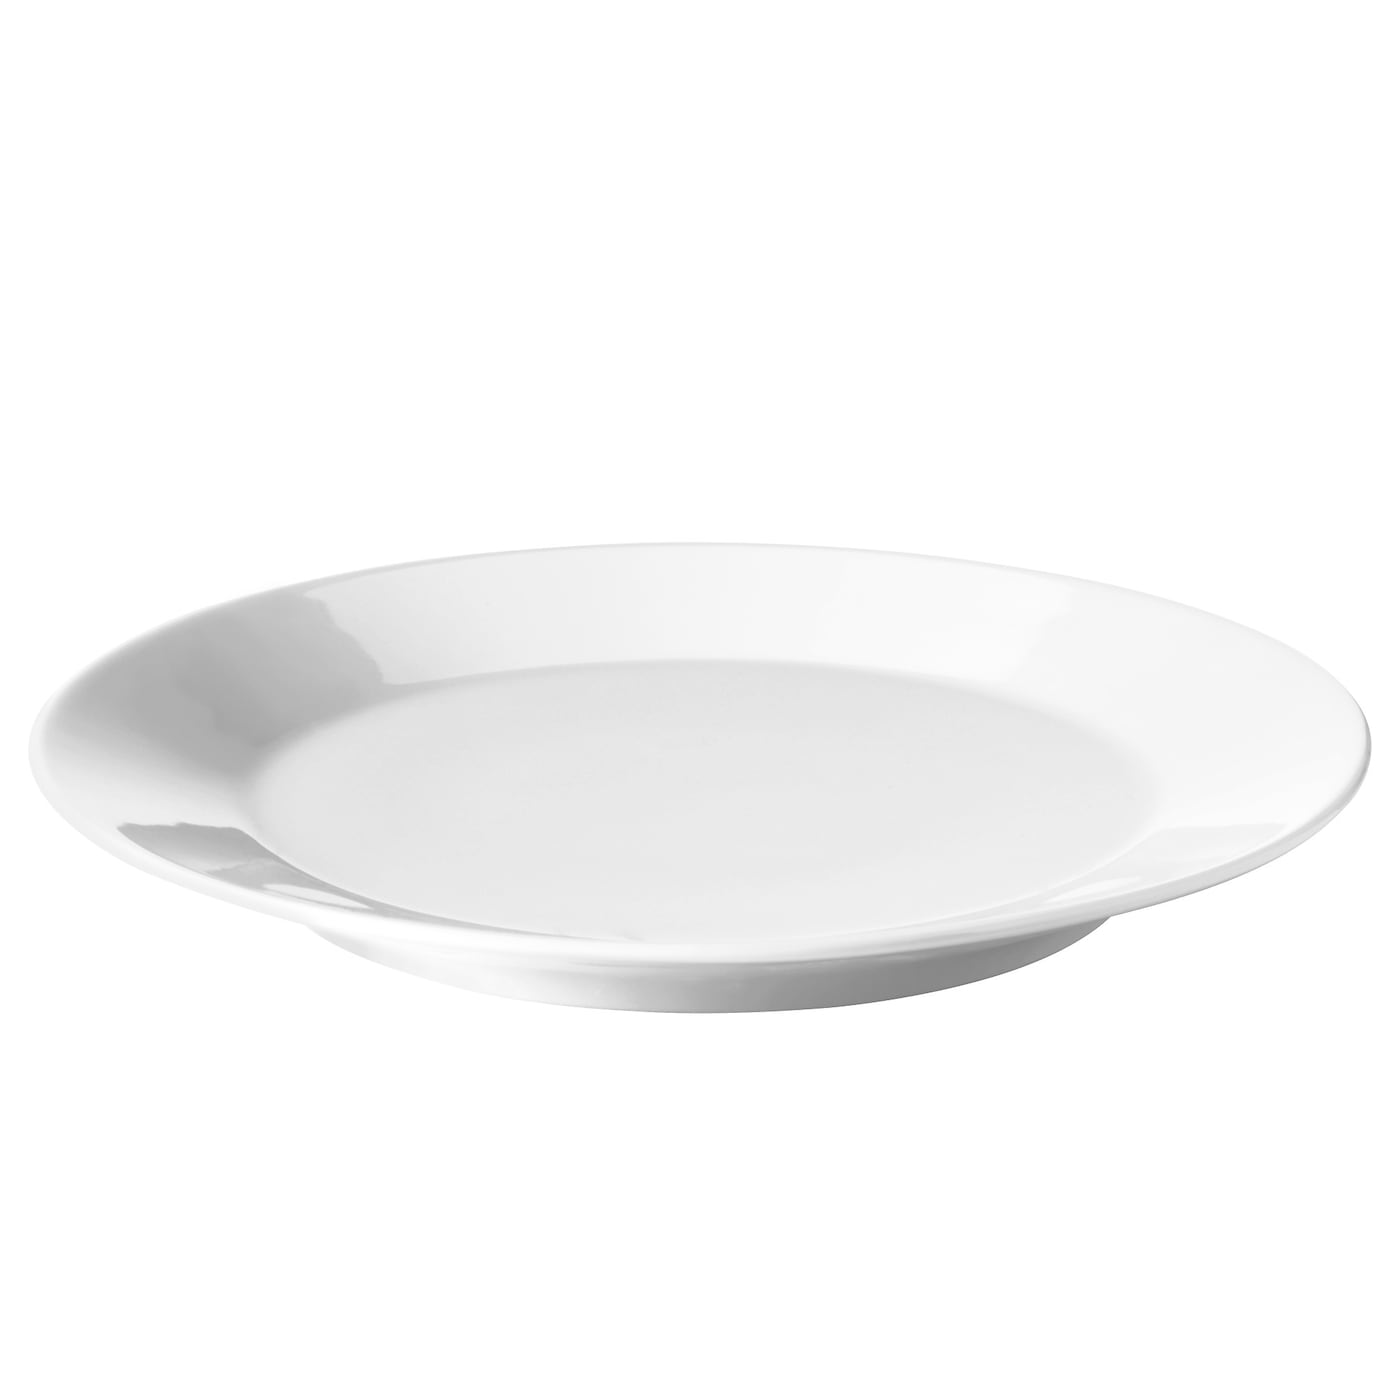 ikea 365 plate white 20 cm ikea. Black Bedroom Furniture Sets. Home Design Ideas